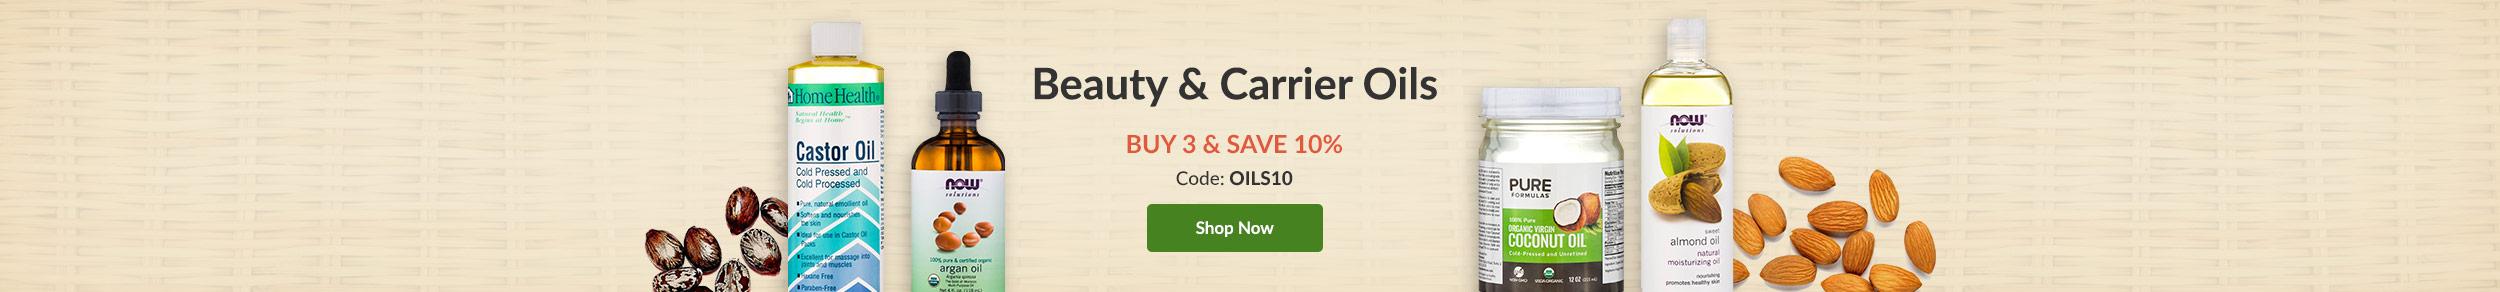 https://i3.pureformulas.net/images/static/Beauty-Carrier-Oils-Essentials_slide3_061918.jpg